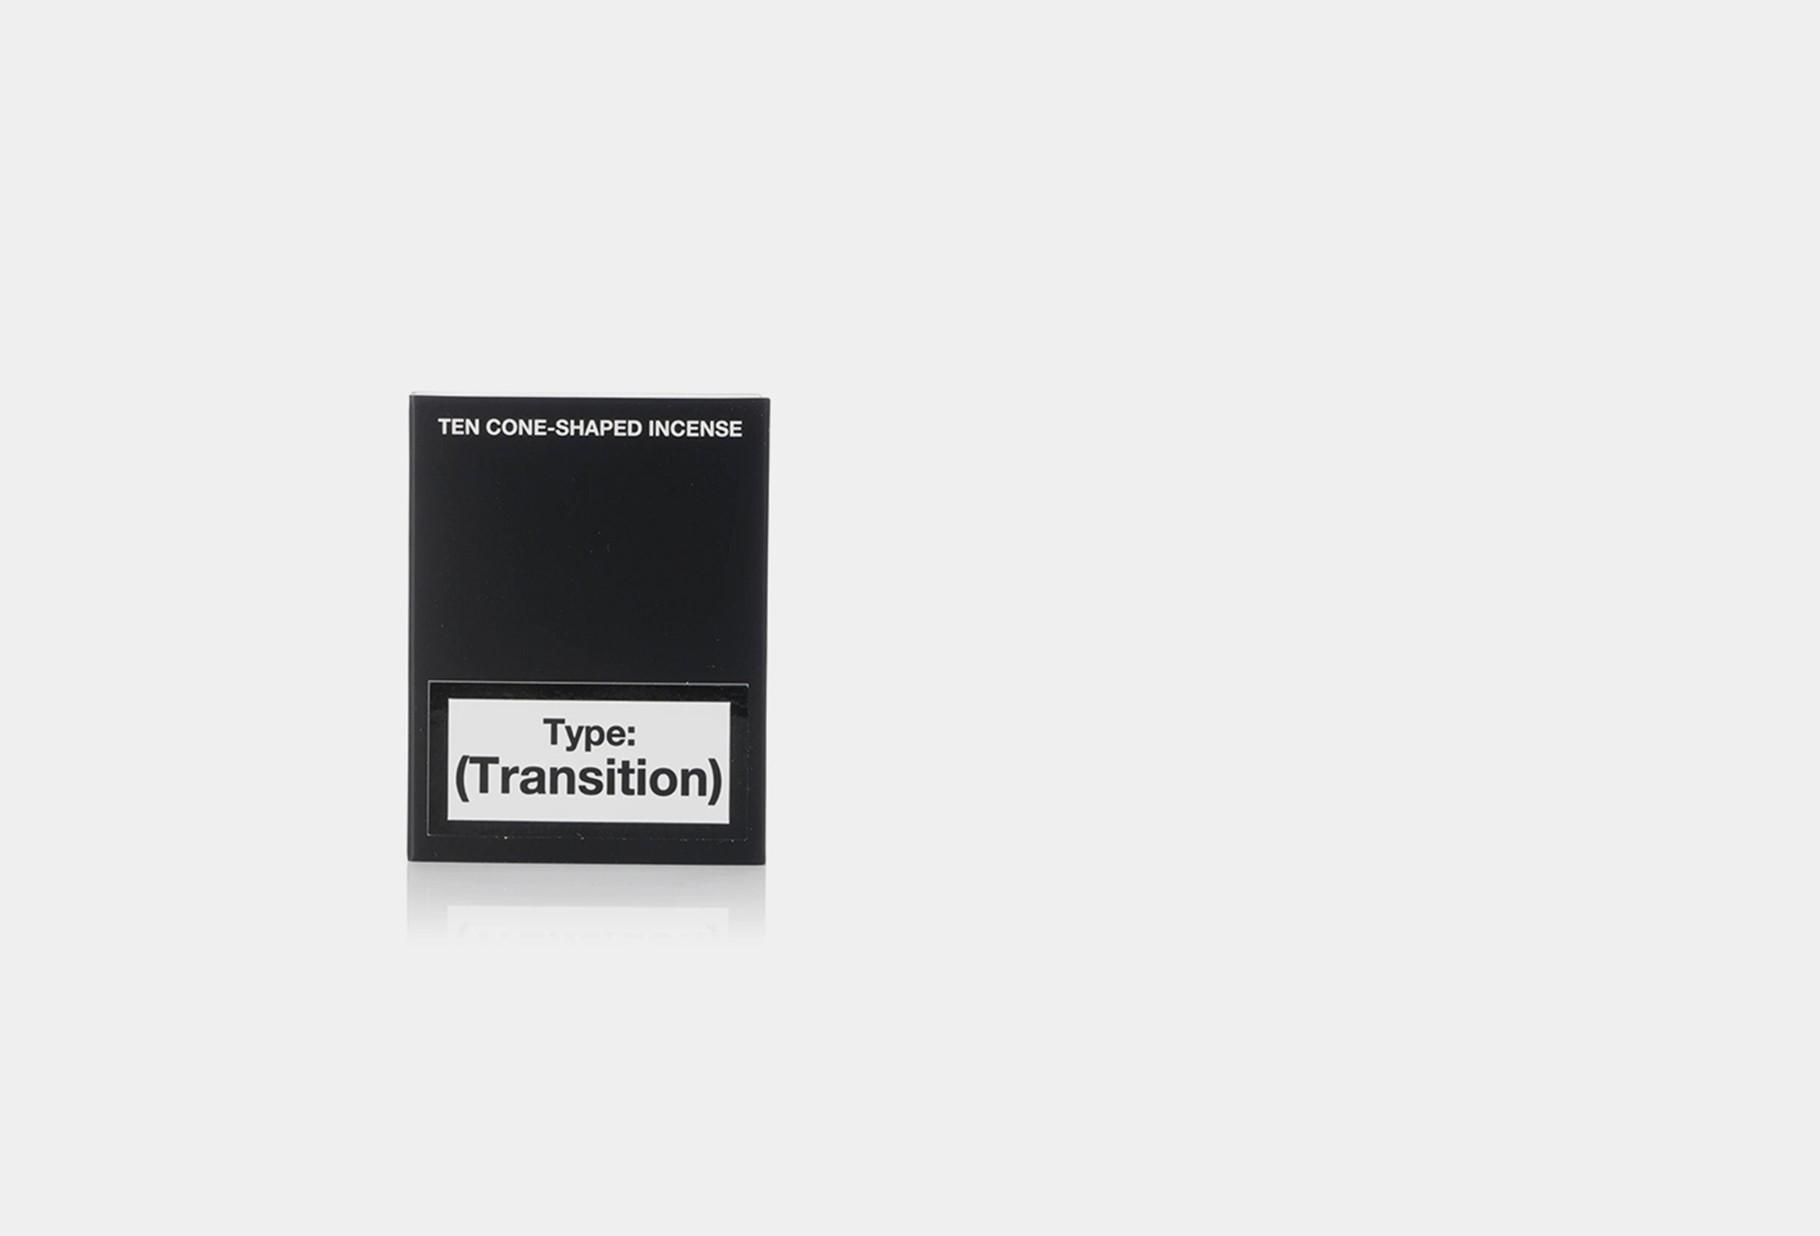 NEIGHBORHOOD / Transition cone / incense